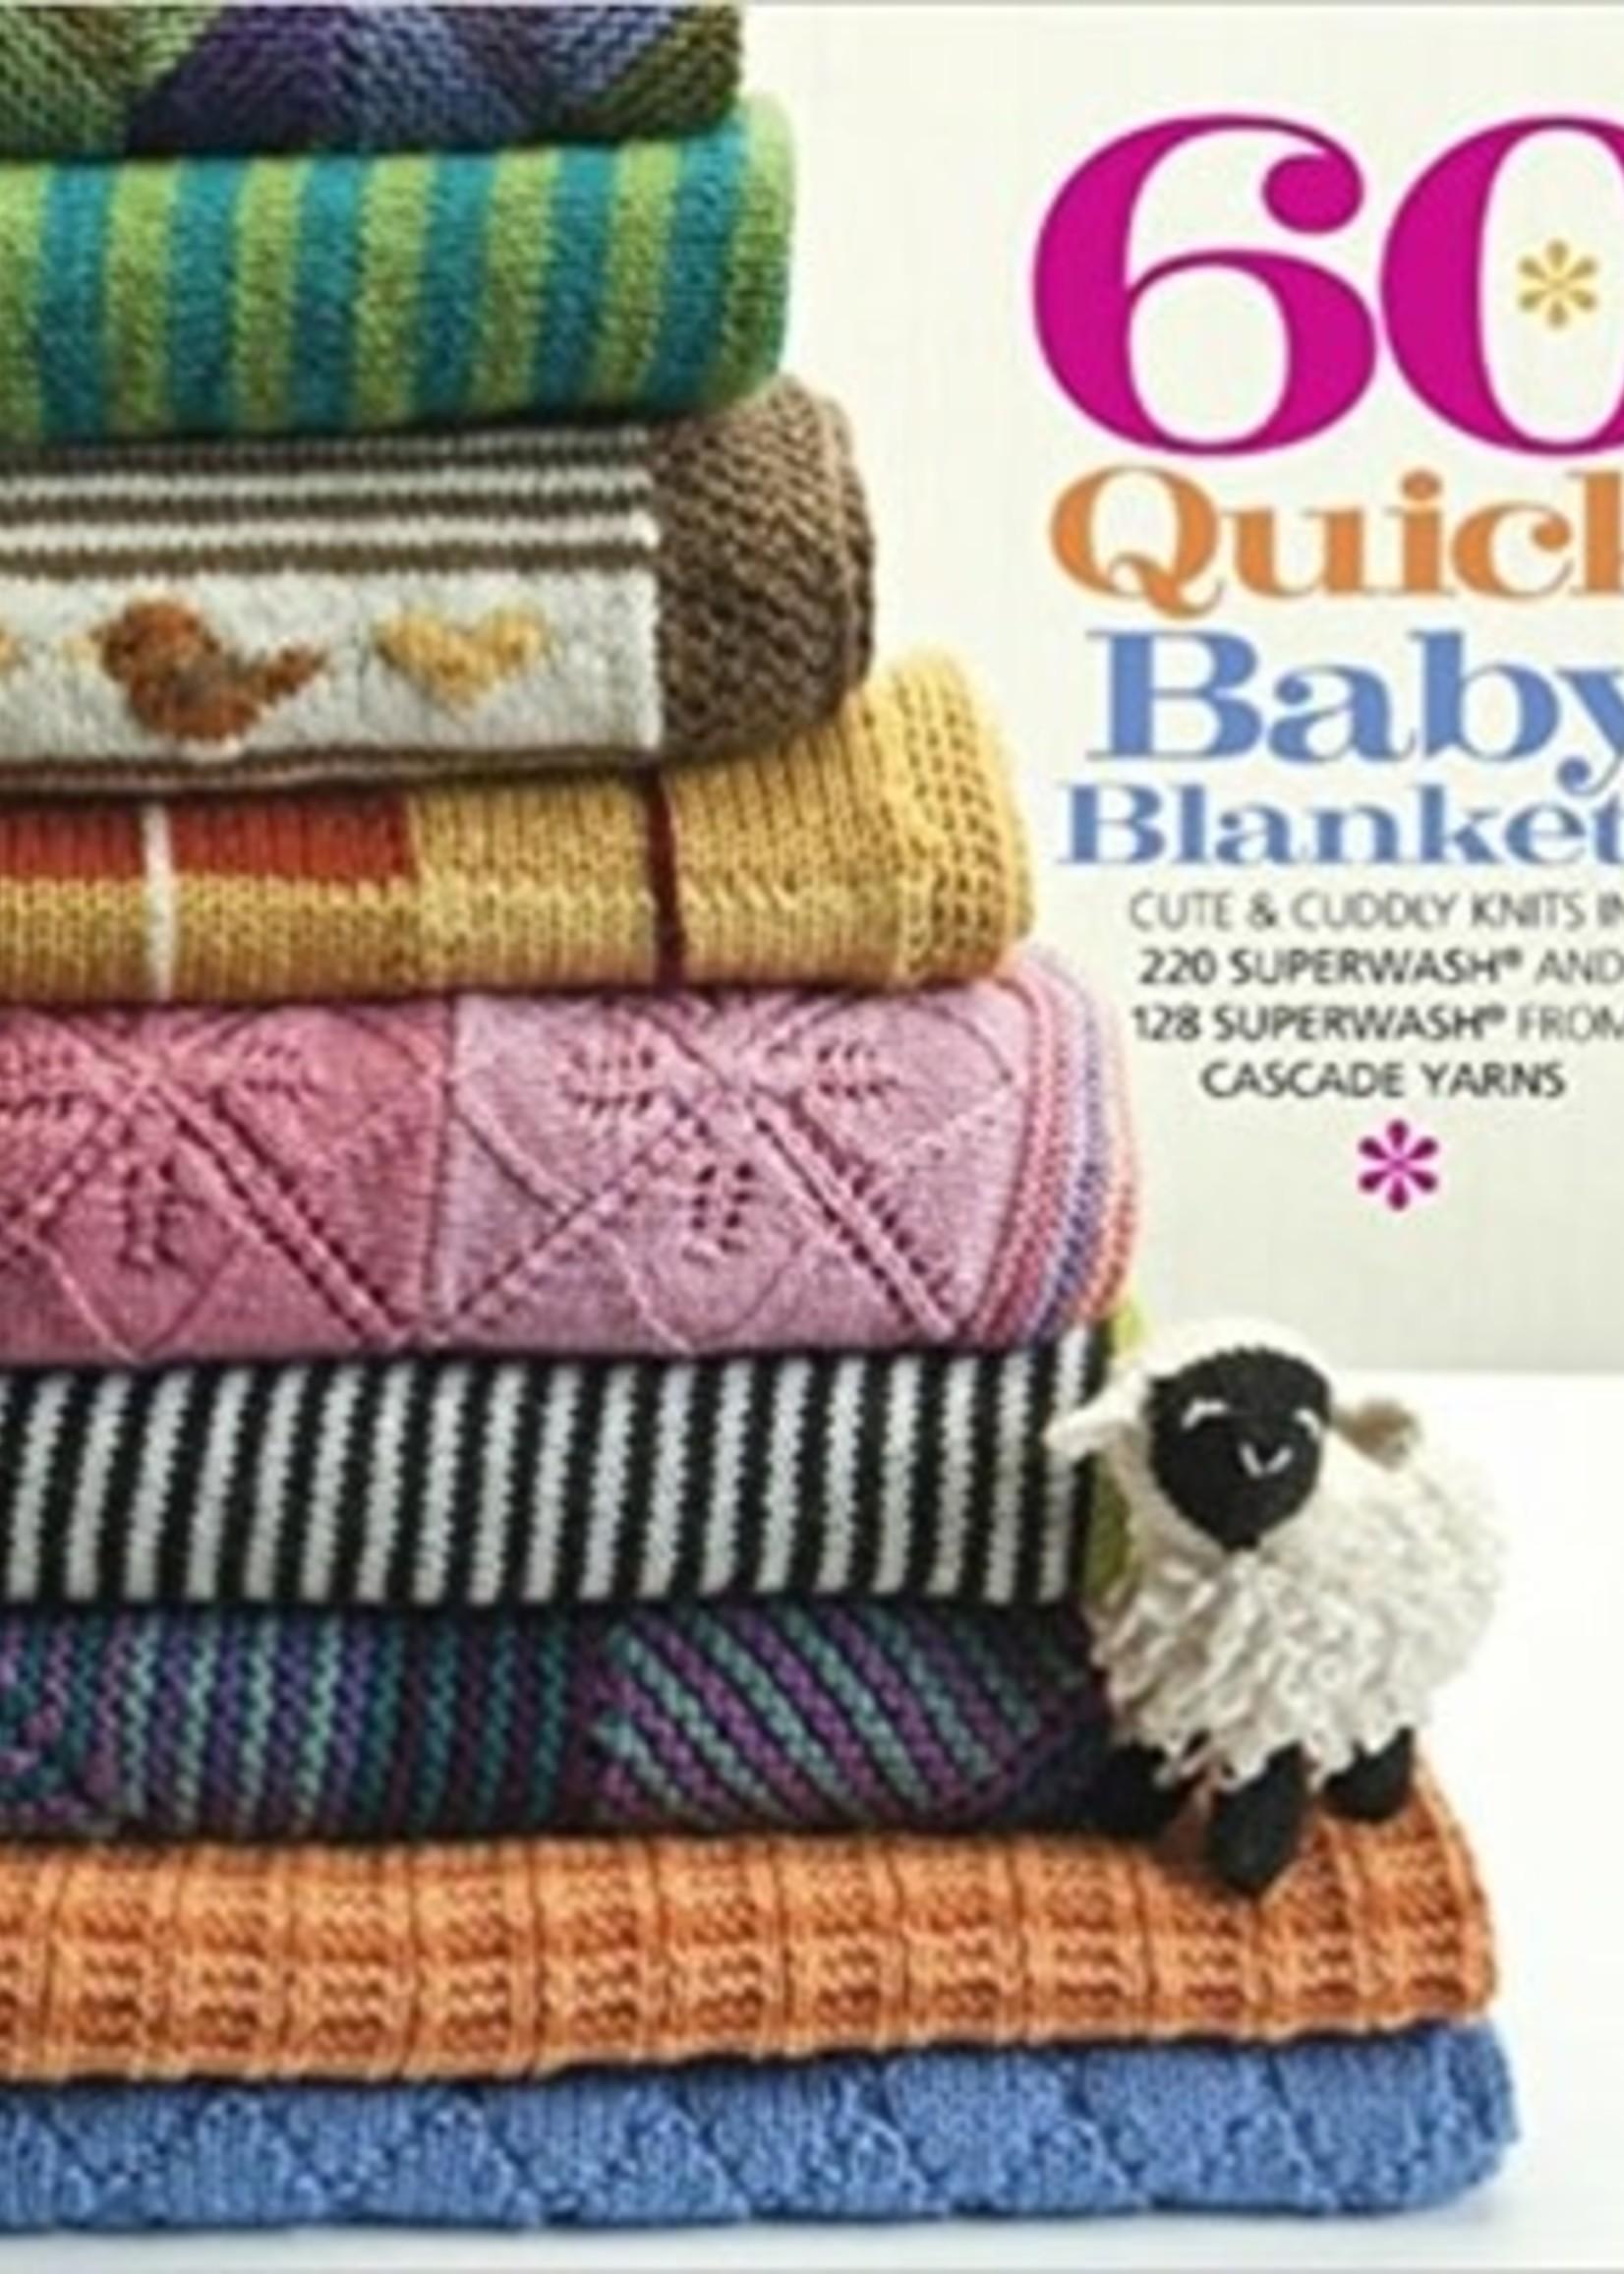 Cascade 60 Quick Baby Blankets